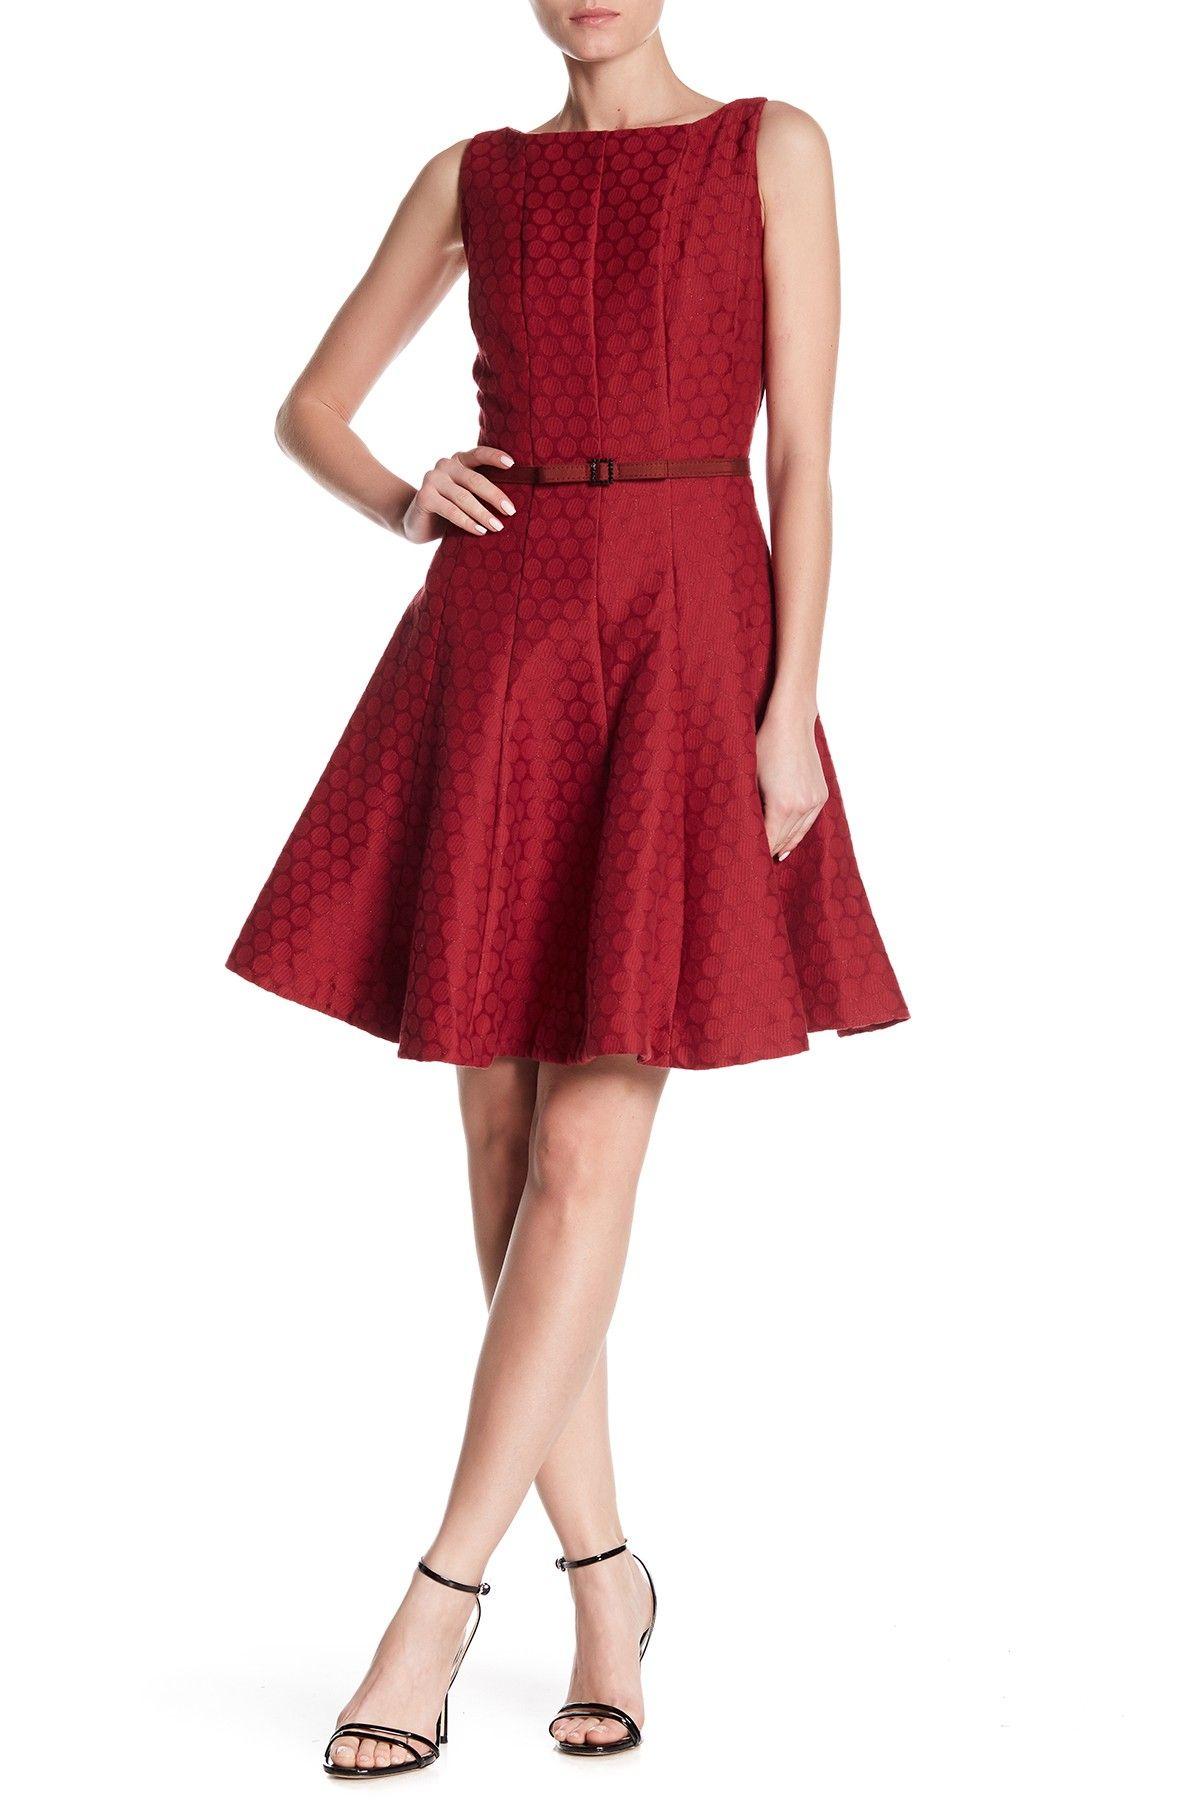 0e68c697631 Dot Print Waist Belt Dress by Gabby Skye on  nordstrom rack Short  Bridesmaid Dresses